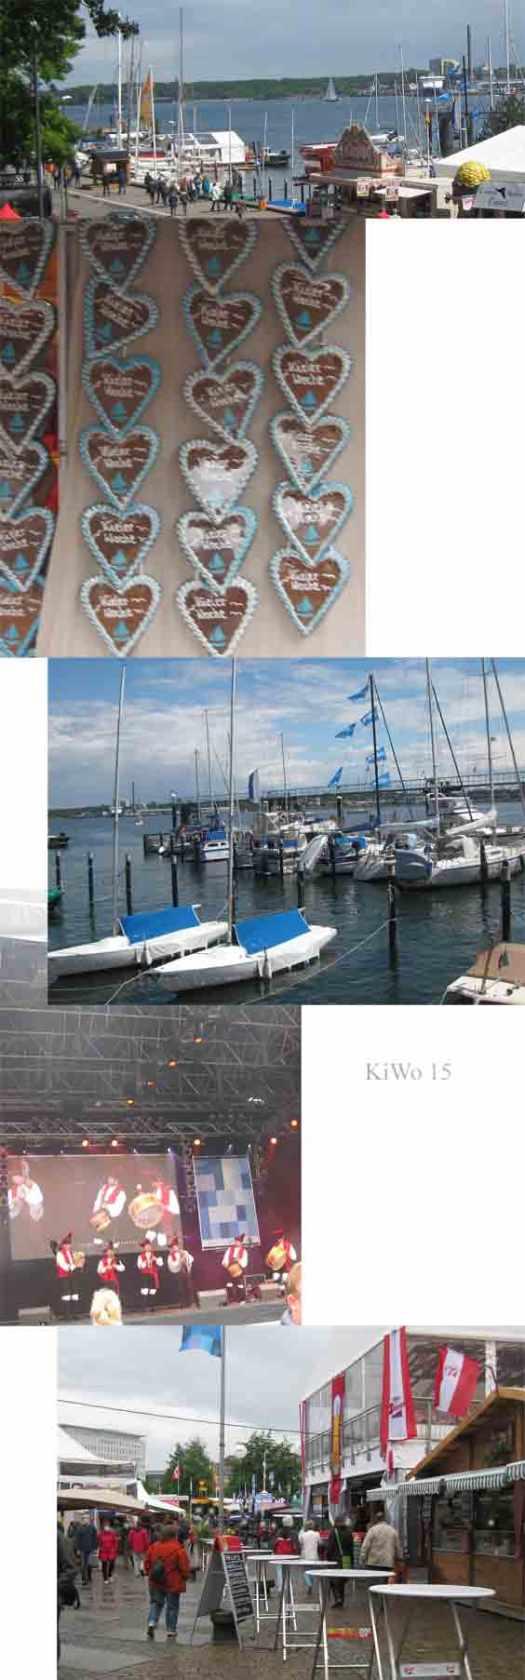 Kieler Woche 2015 Schiffe